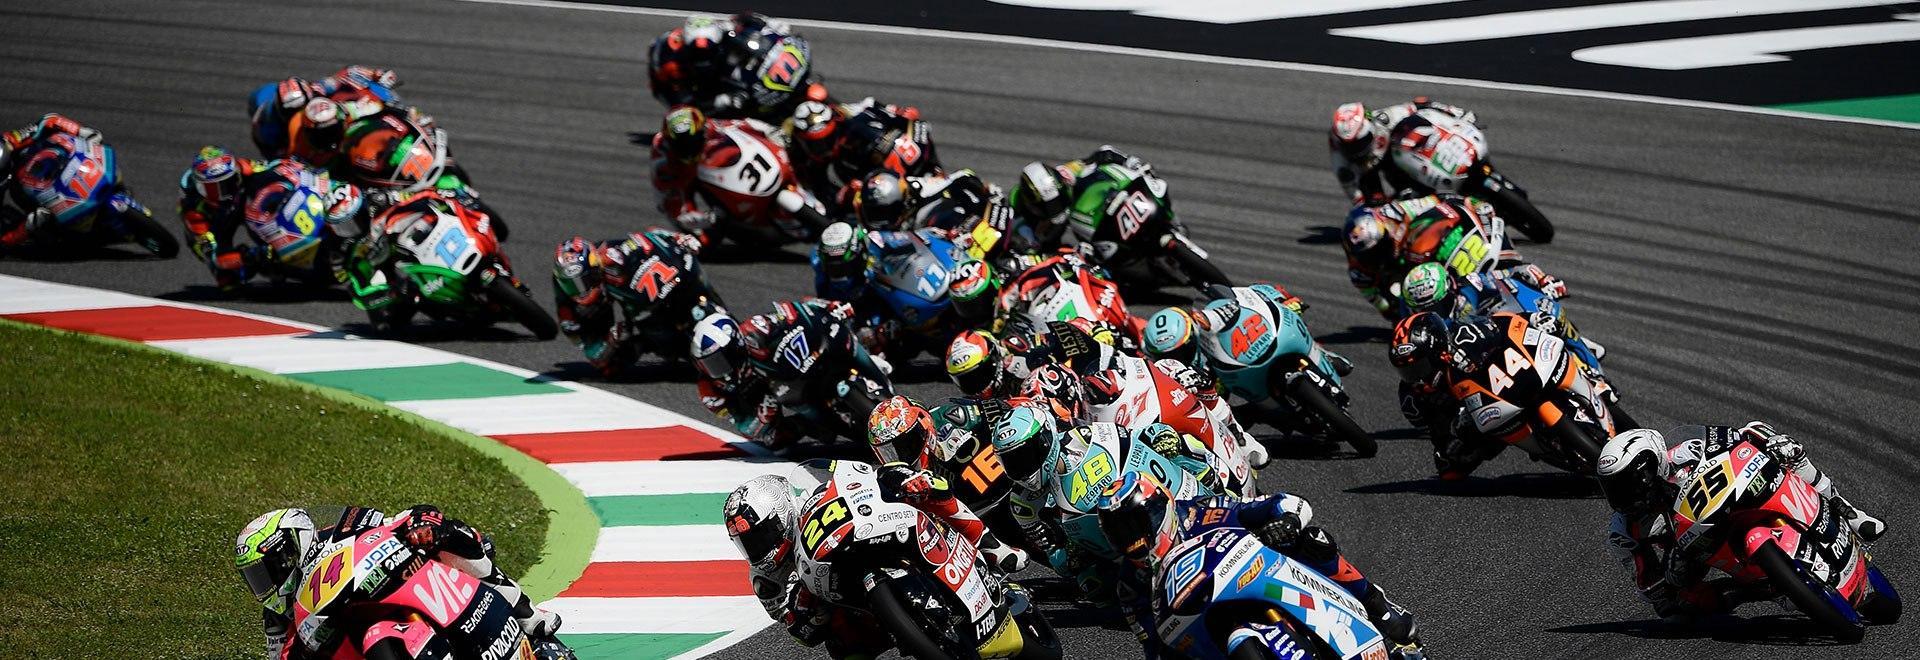 Supersport Vallelunga. Race 1